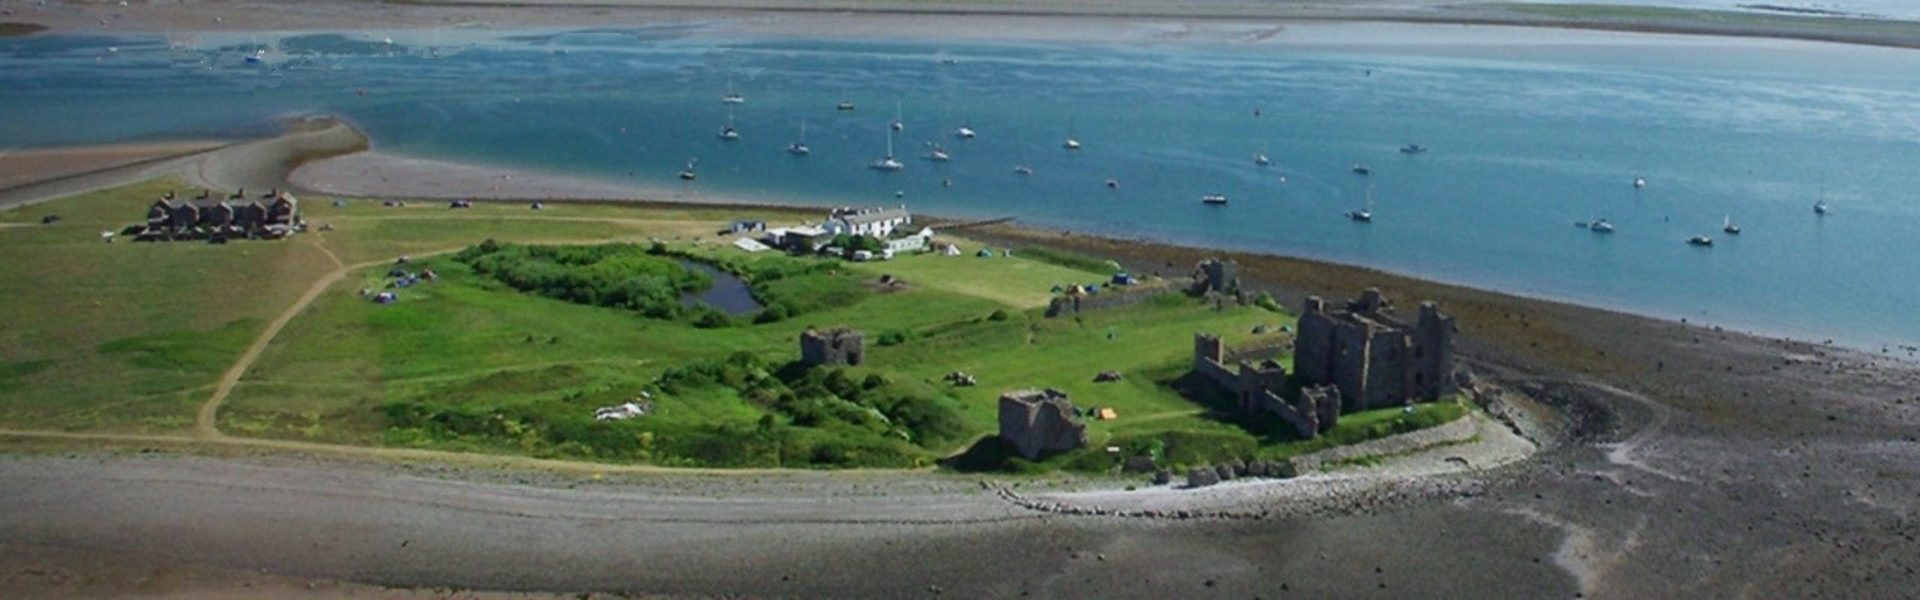 Piel Island